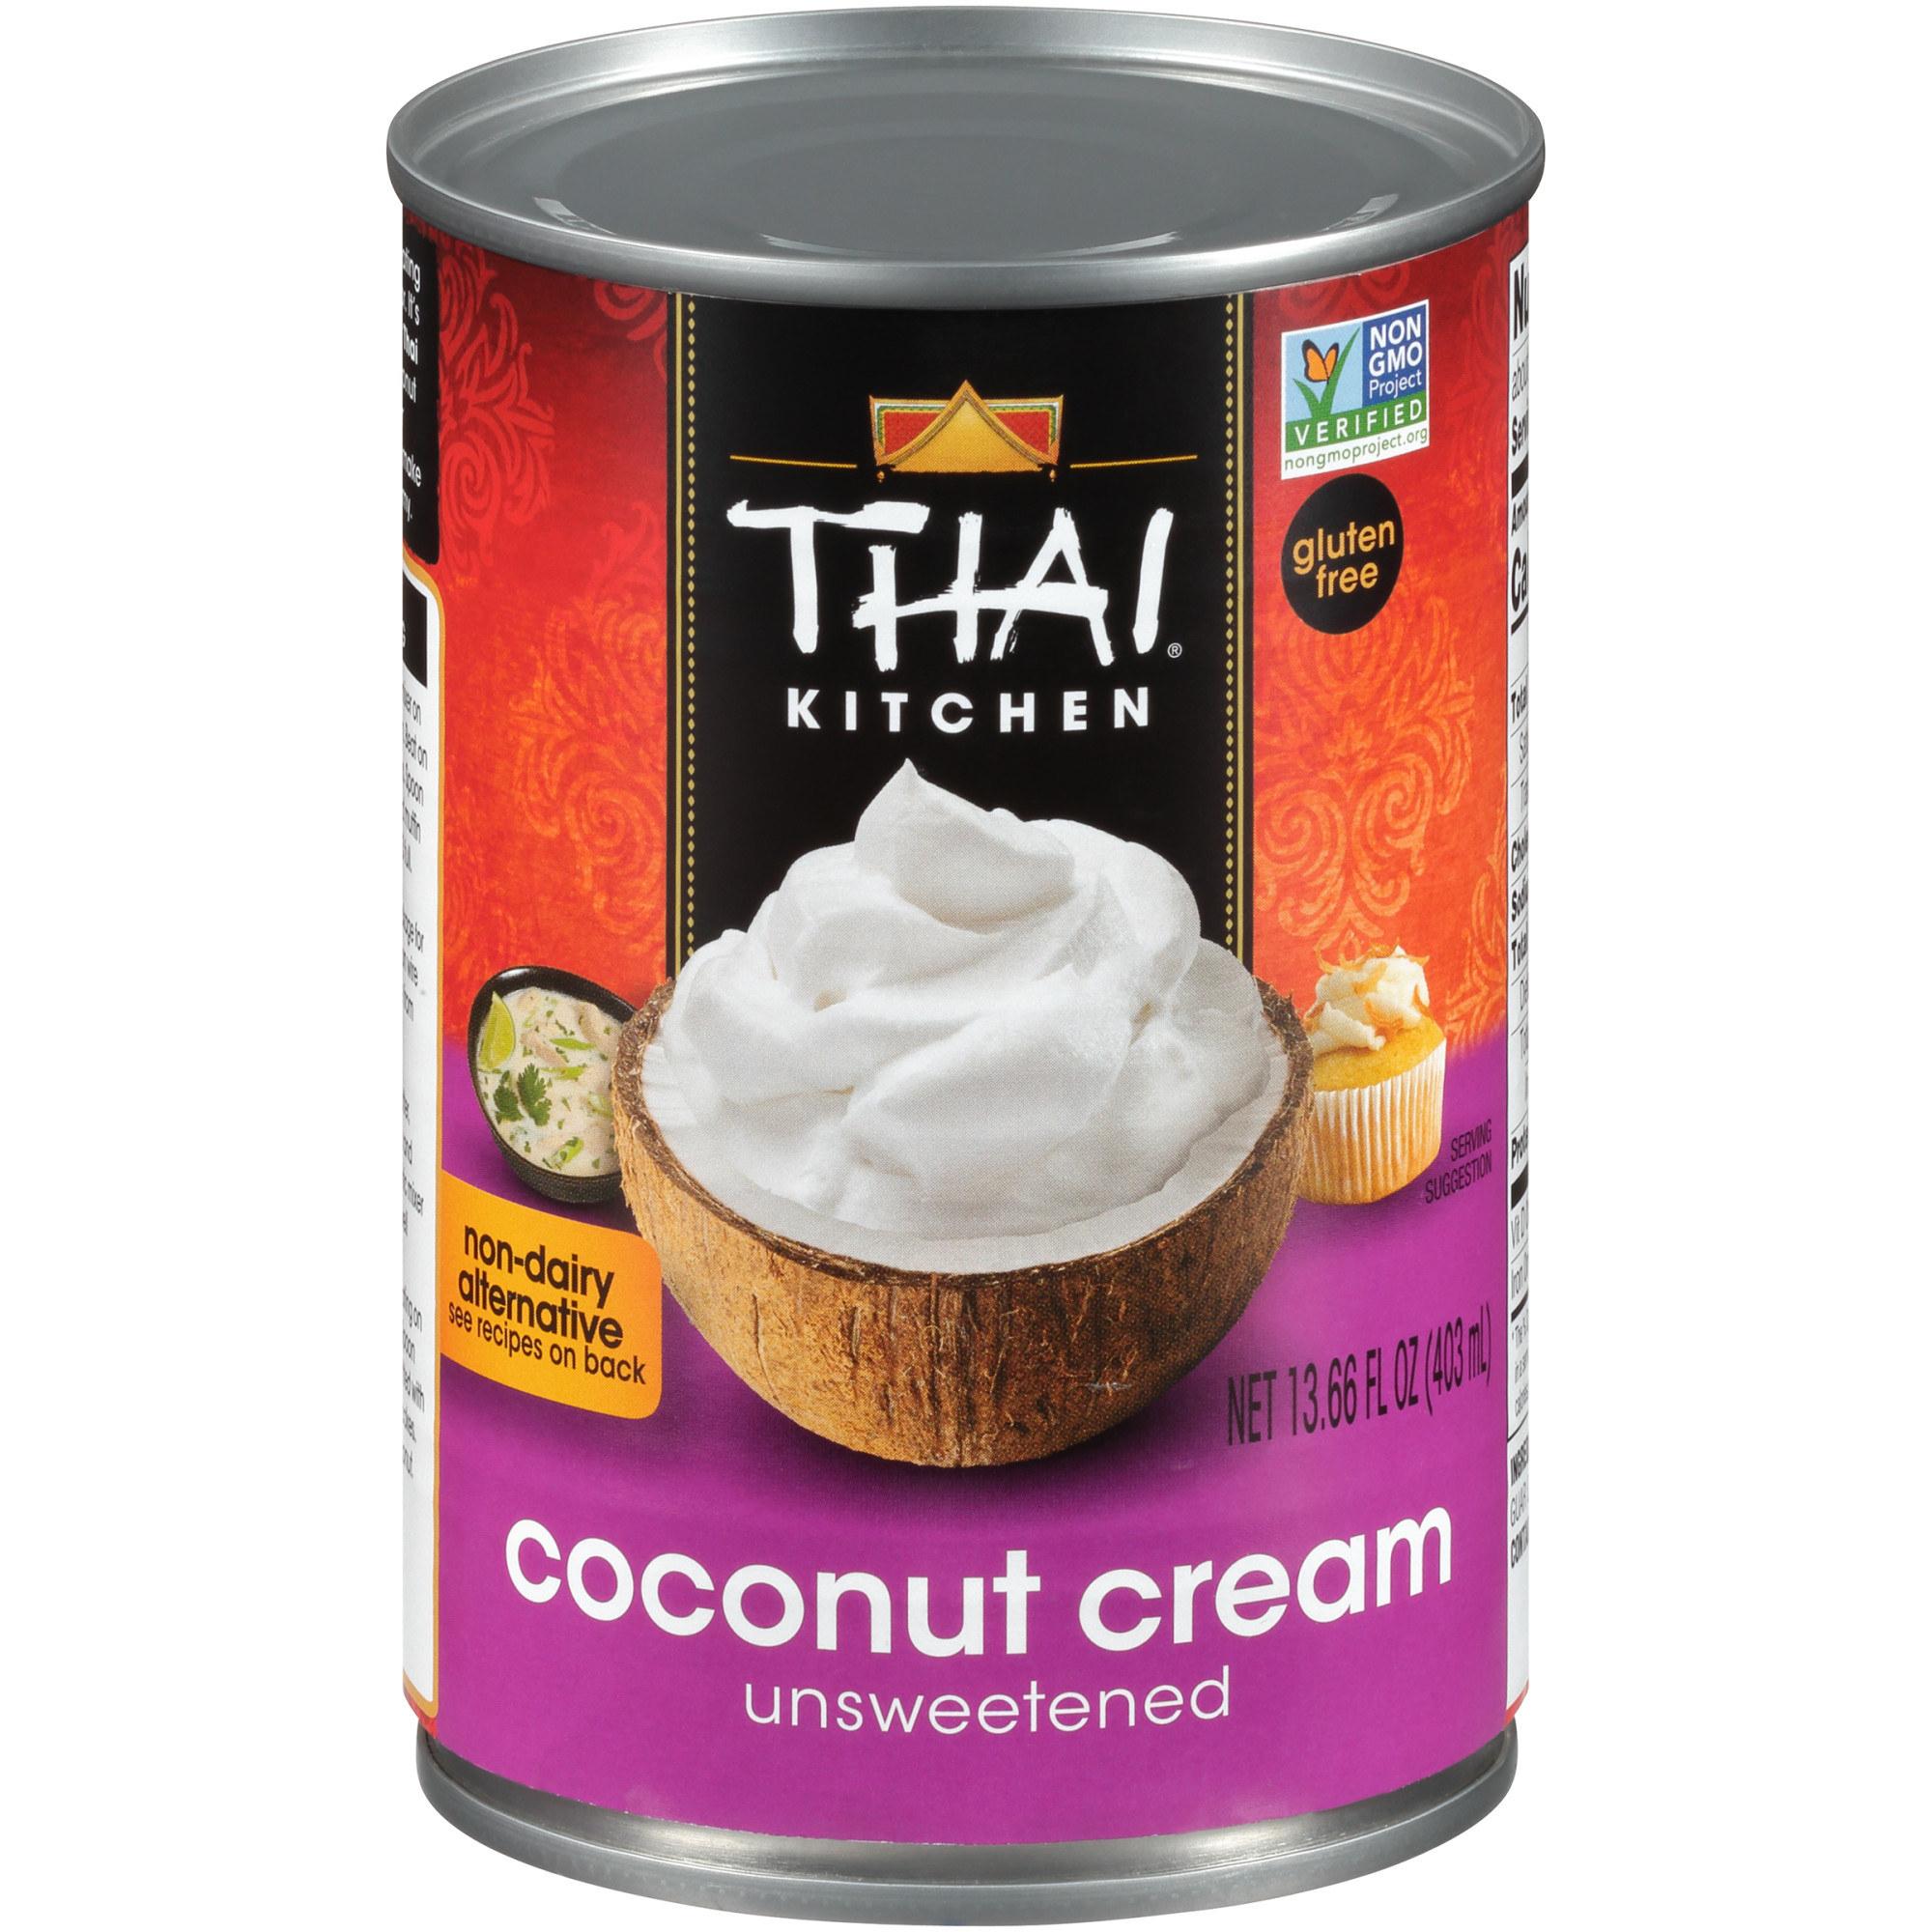 The purple can of coconut cream